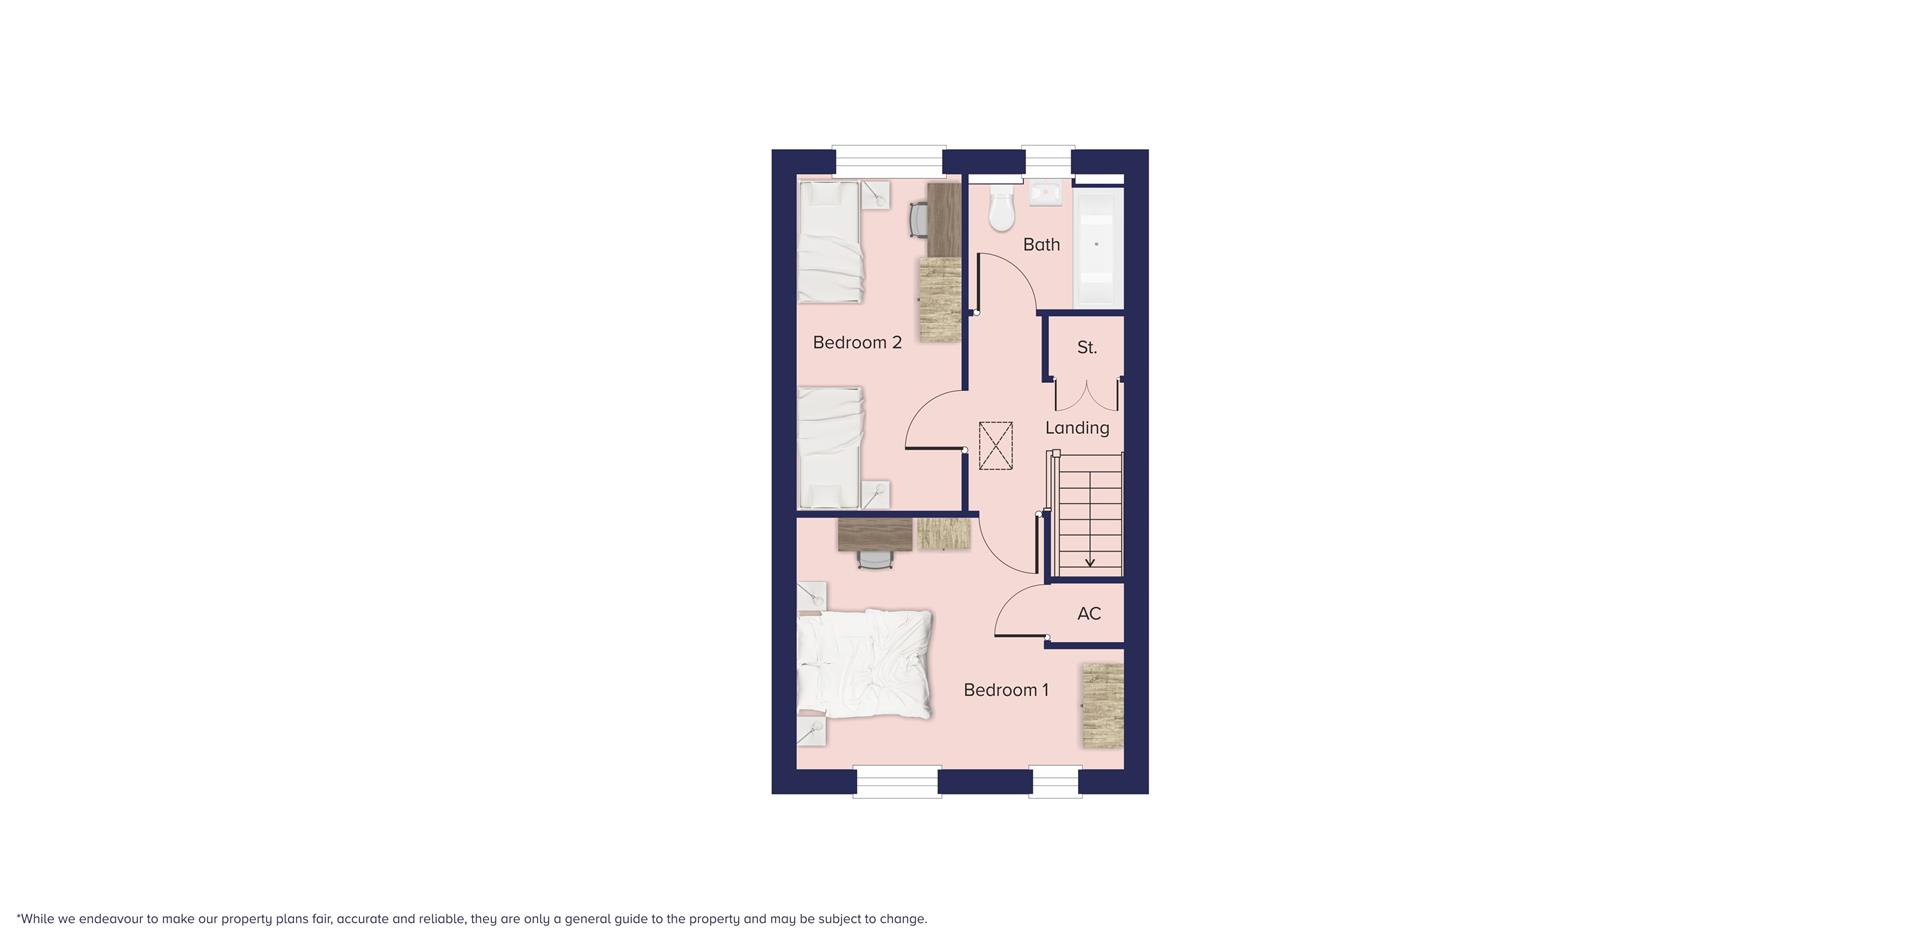 Boorley Park, Botley_Plots 288, 289, 290 & 291_FF_